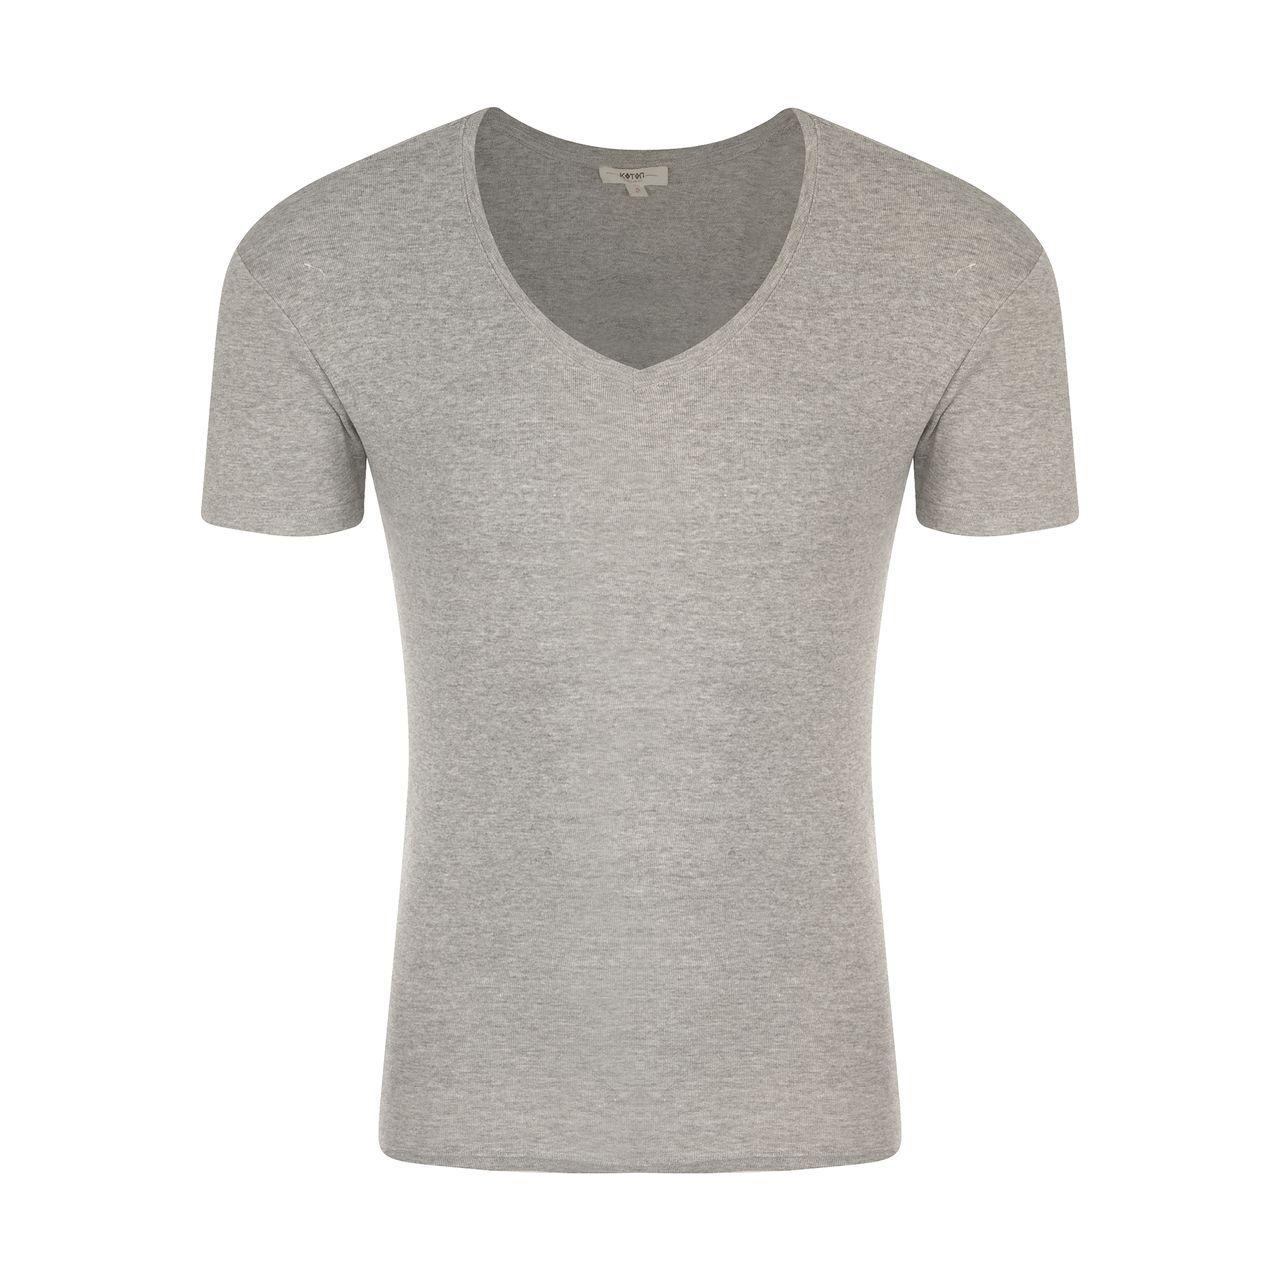 تی شرت مردانه کوتون مدل 7KAM15139LK-027